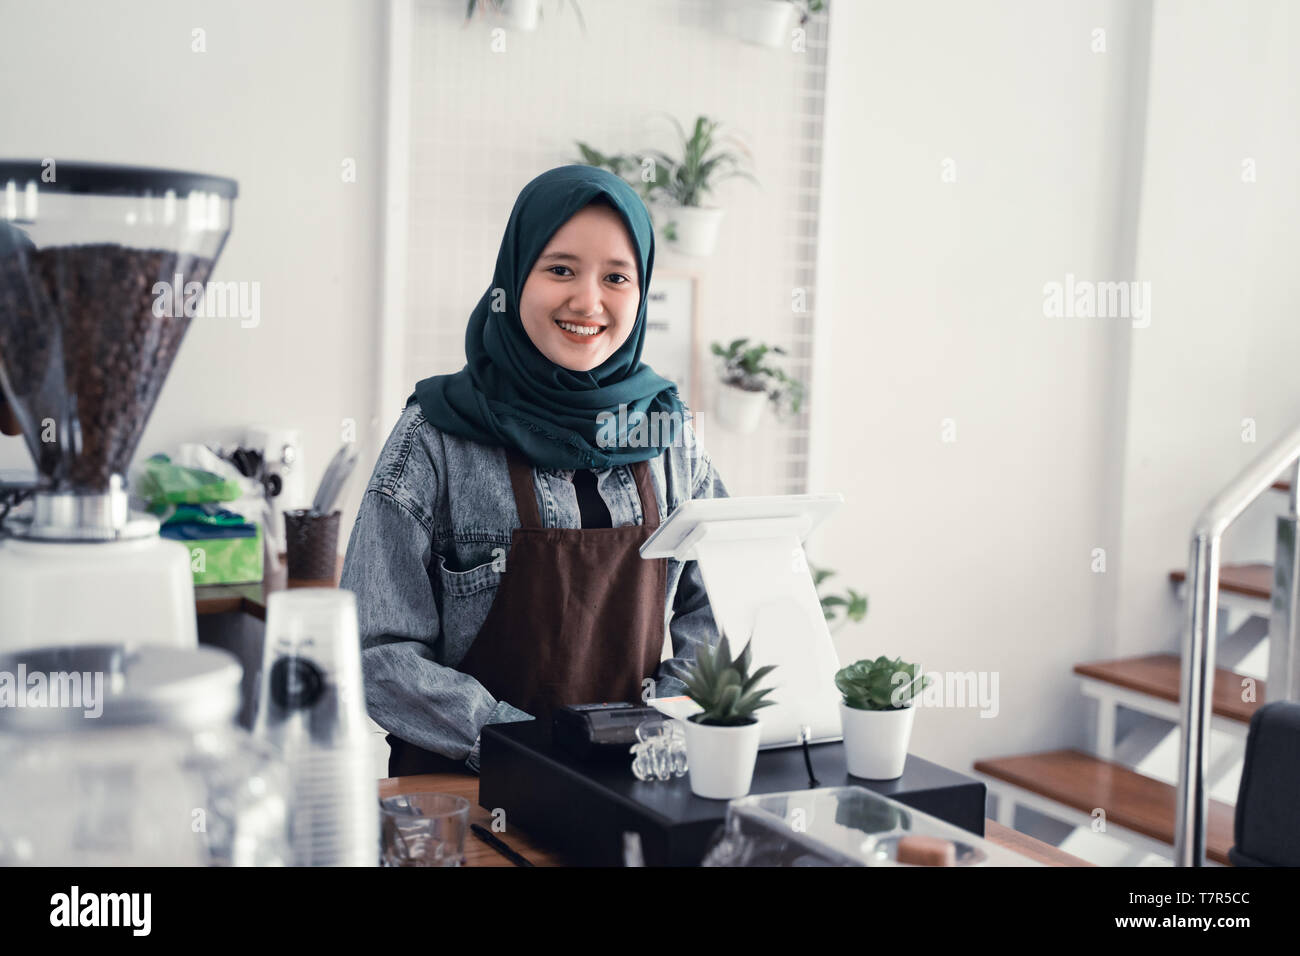 Camarero musulmán en cafe counter Foto de stock